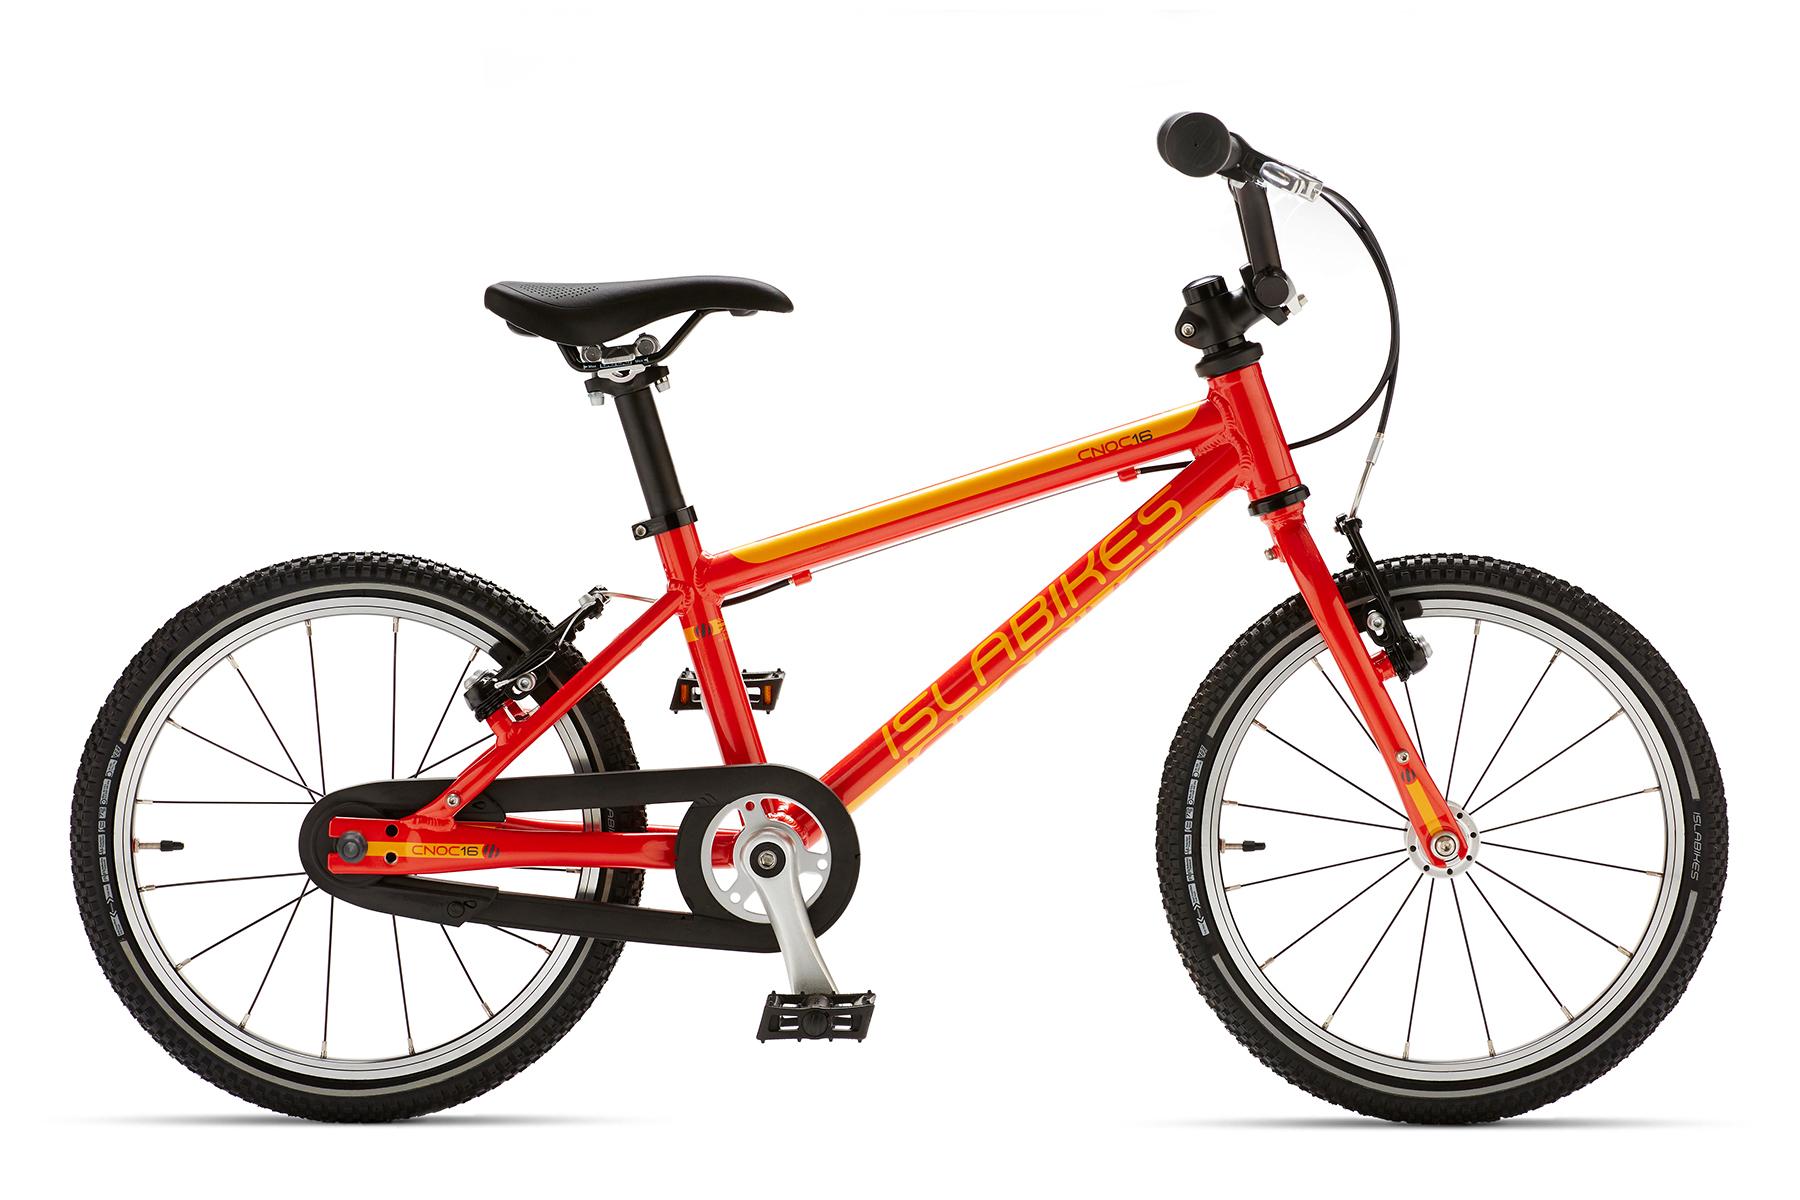 Islabikes Cnoc 16 – Quality, lightweight bike for children age 4+